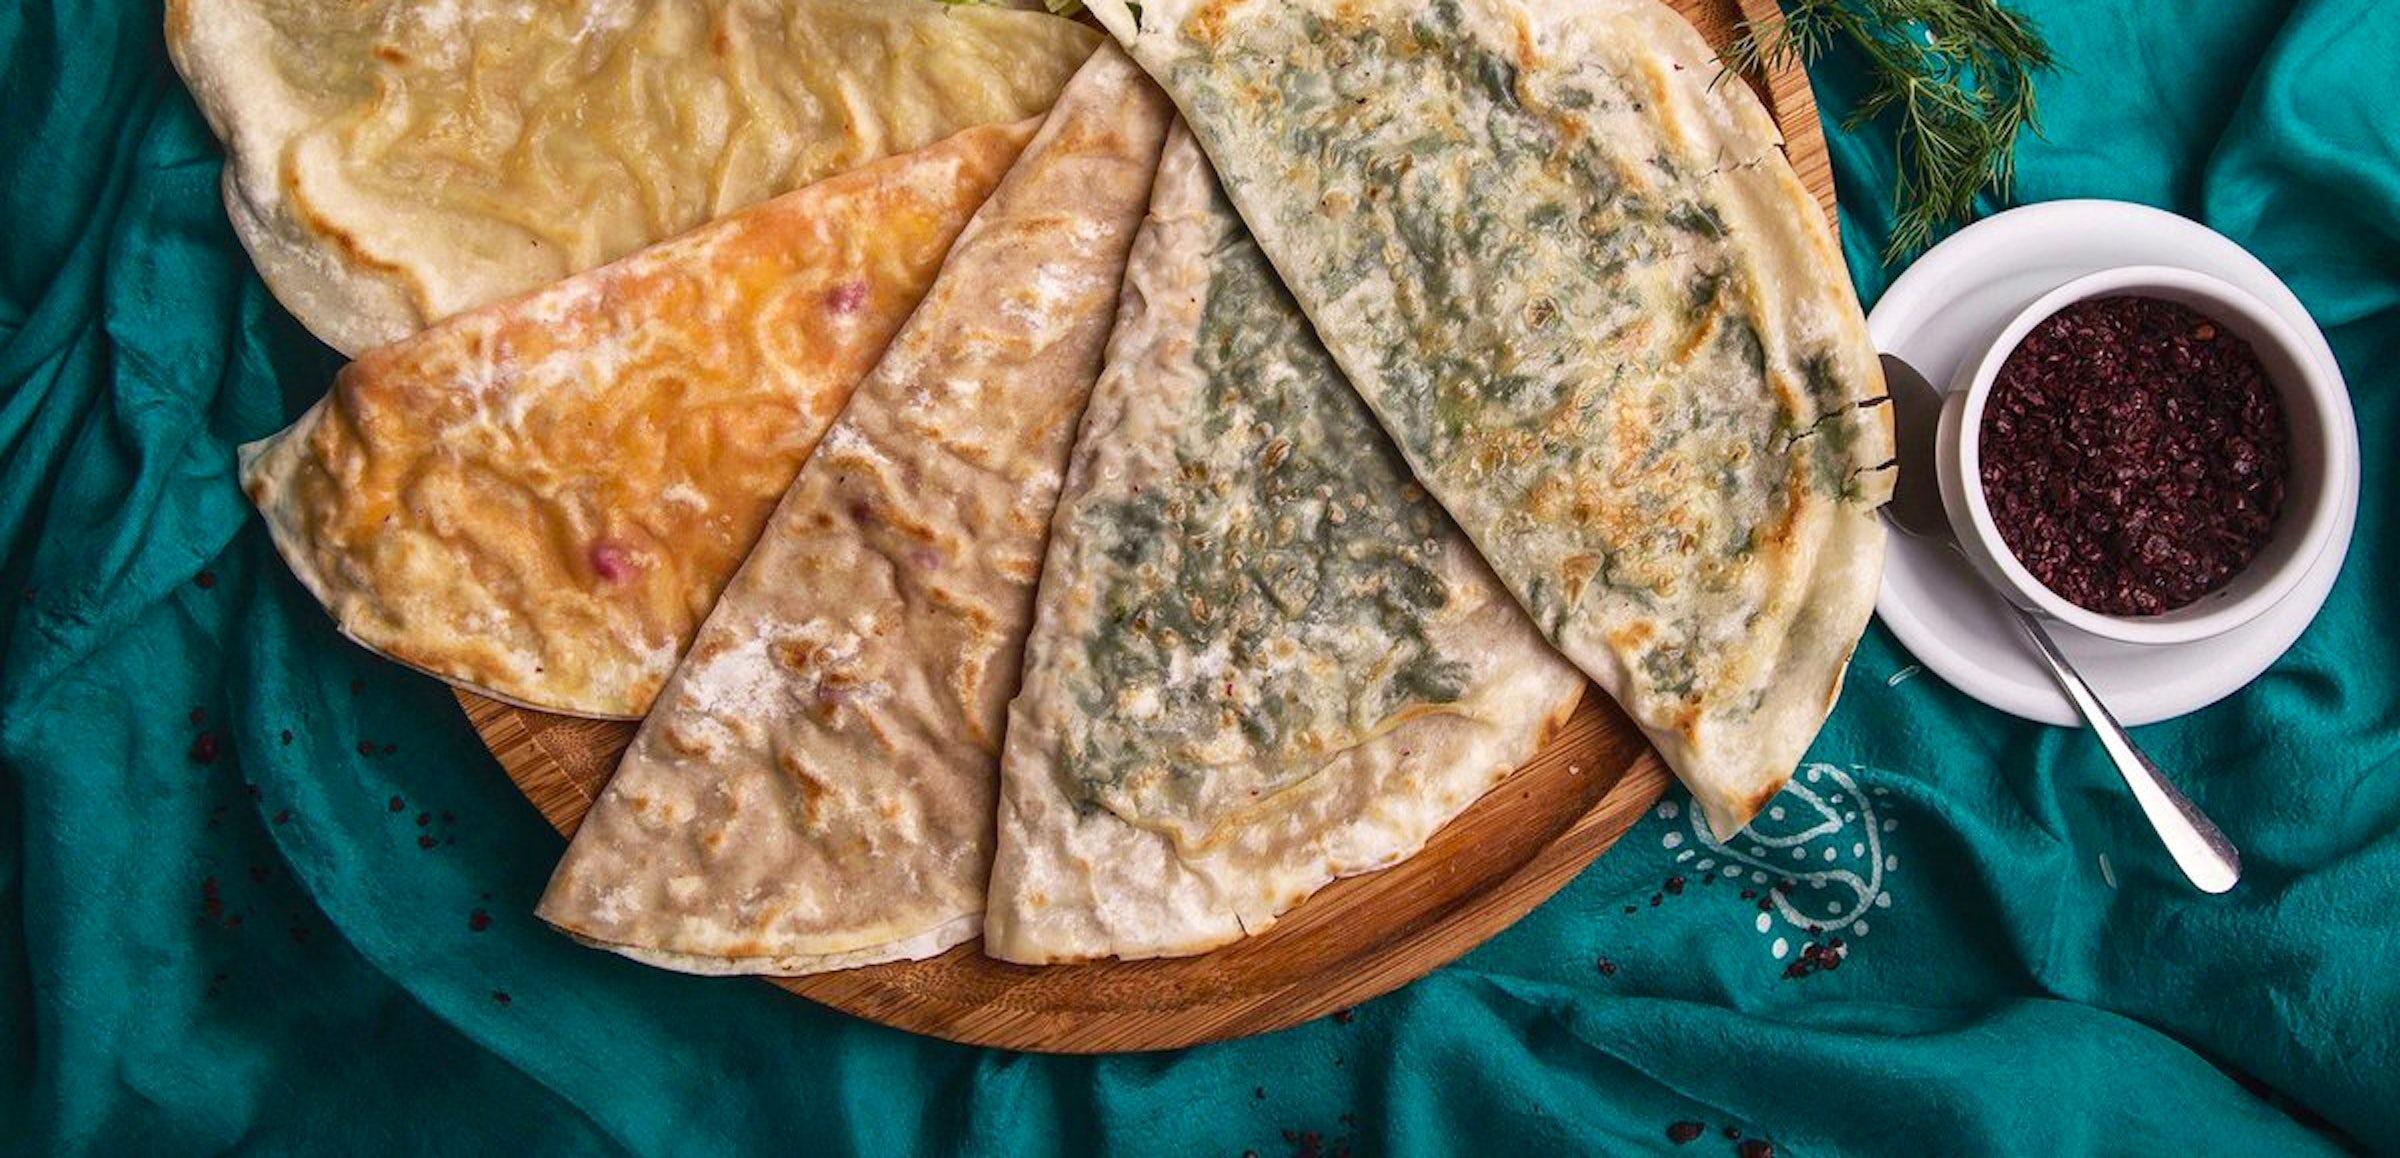 Azerbaijani cuisine: Qutab